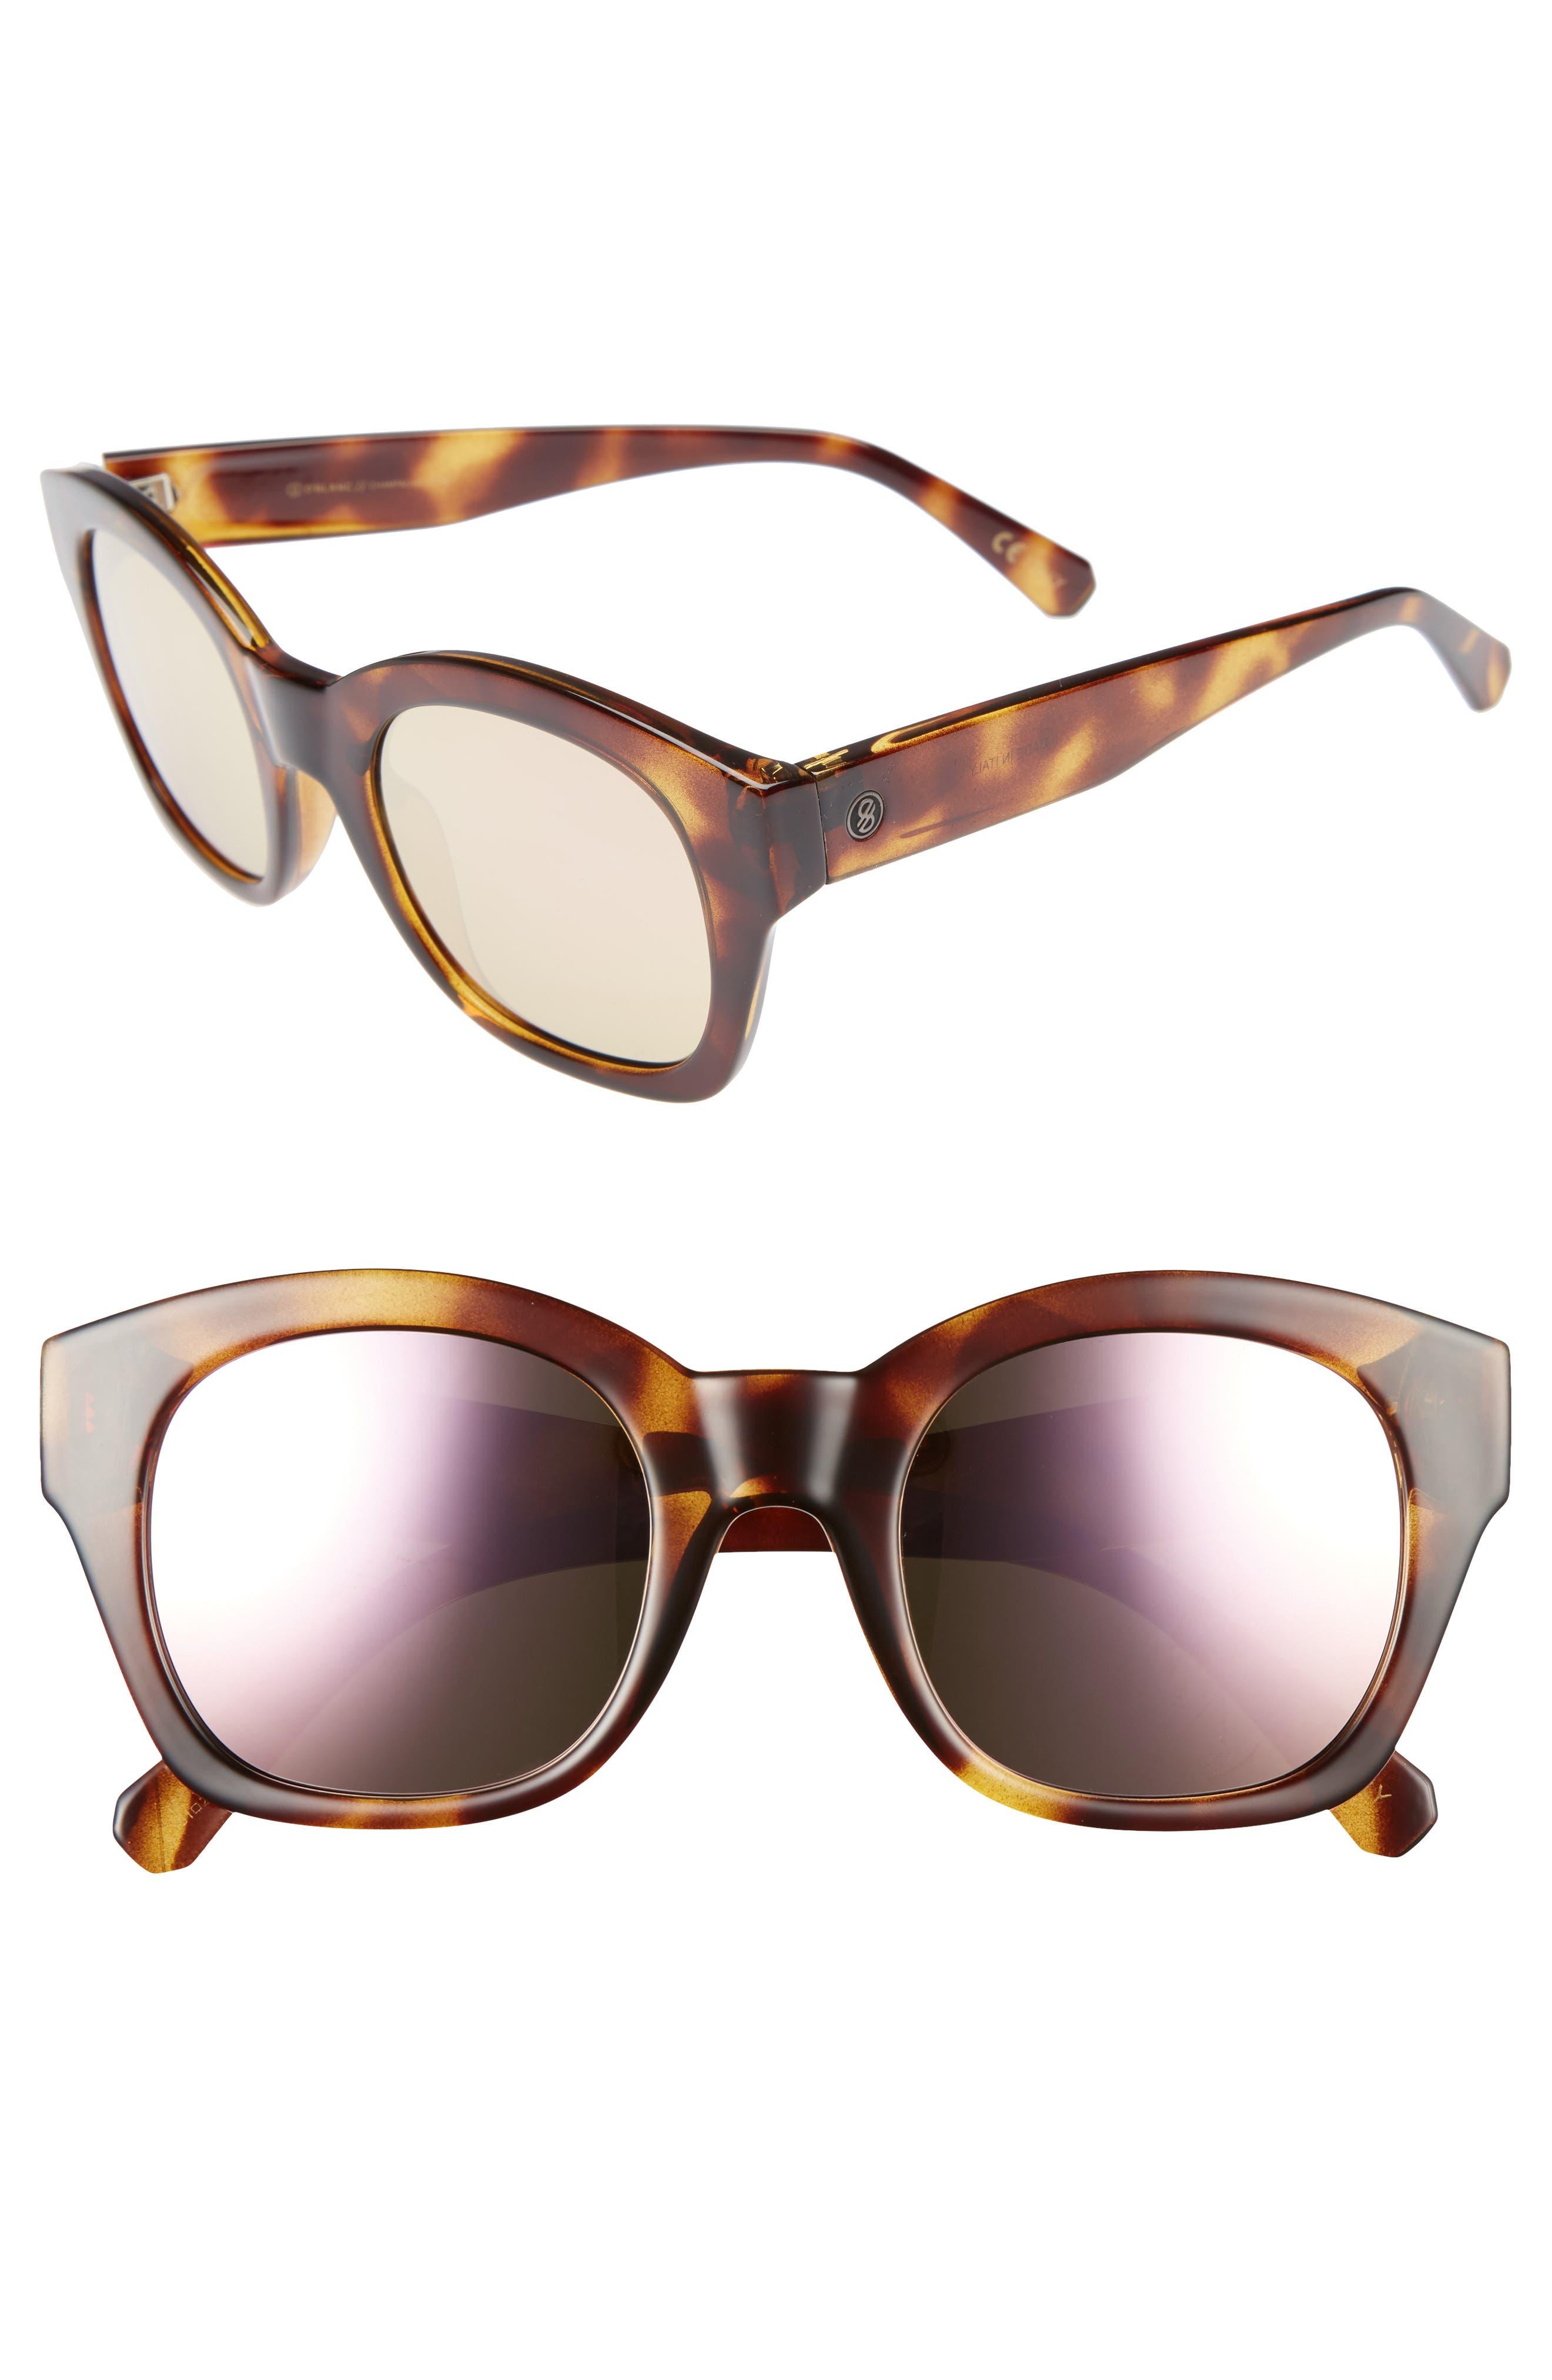 DBLANC DBLANC Champagne Coast 51mm Gradient Square Retro Sunglasses